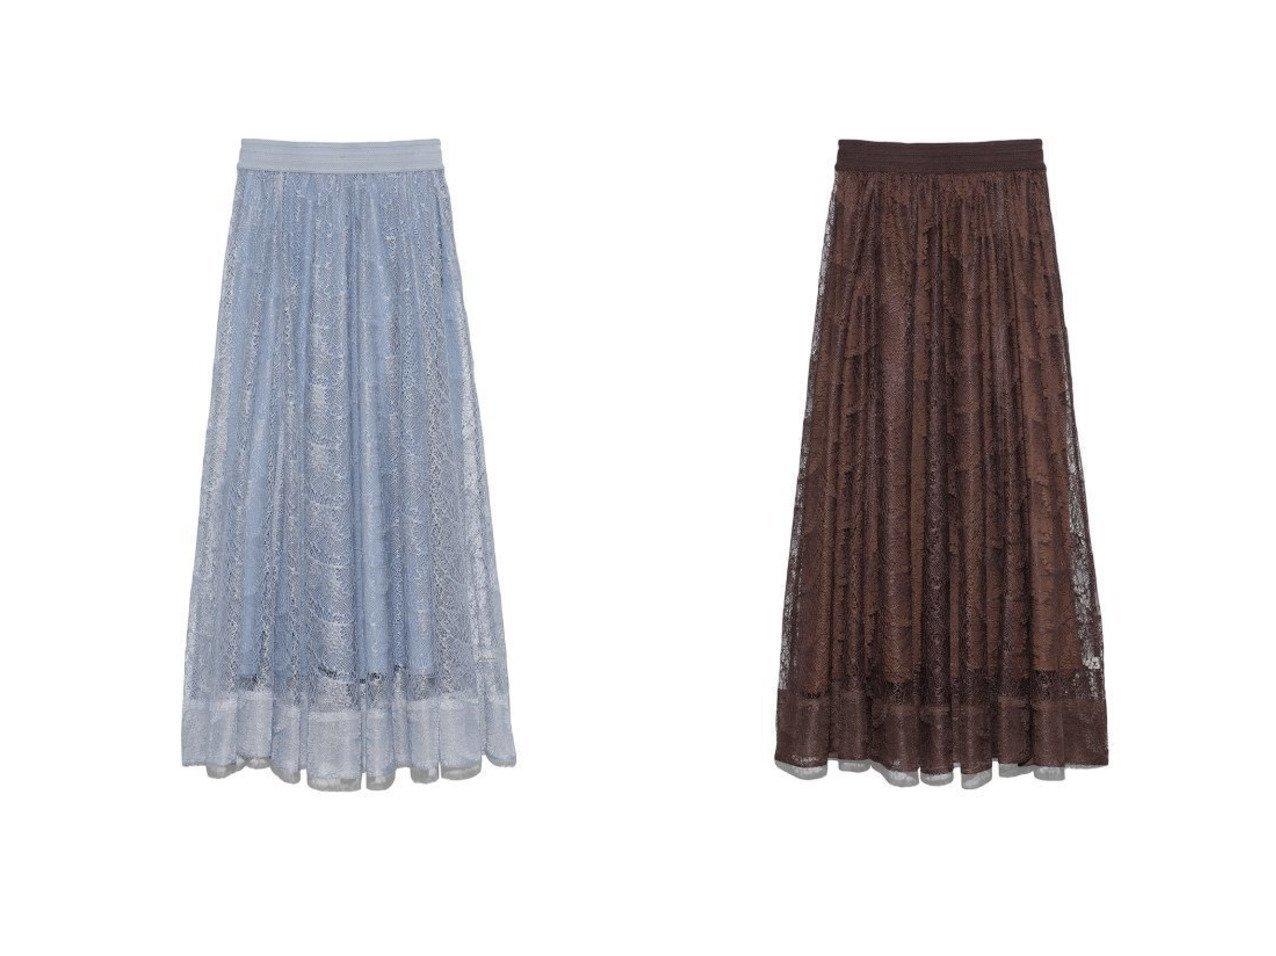 【Lily Brown/リリーブラウン】のバタフライレースロングスカート リリーブラウンのおすすめ!人気、トレンド・レディースファッションの通販 おすすめで人気の流行・トレンド、ファッションの通販商品 メンズファッション・キッズファッション・インテリア・家具・レディースファッション・服の通販 founy(ファニー) https://founy.com/ ファッション Fashion レディースファッション WOMEN スカート Skirt ロングスカート Long Skirt スマート デニム ペチコート メッシュ モチーフ レース 再入荷 Restock/Back in Stock/Re Arrival |ID:crp329100000020869